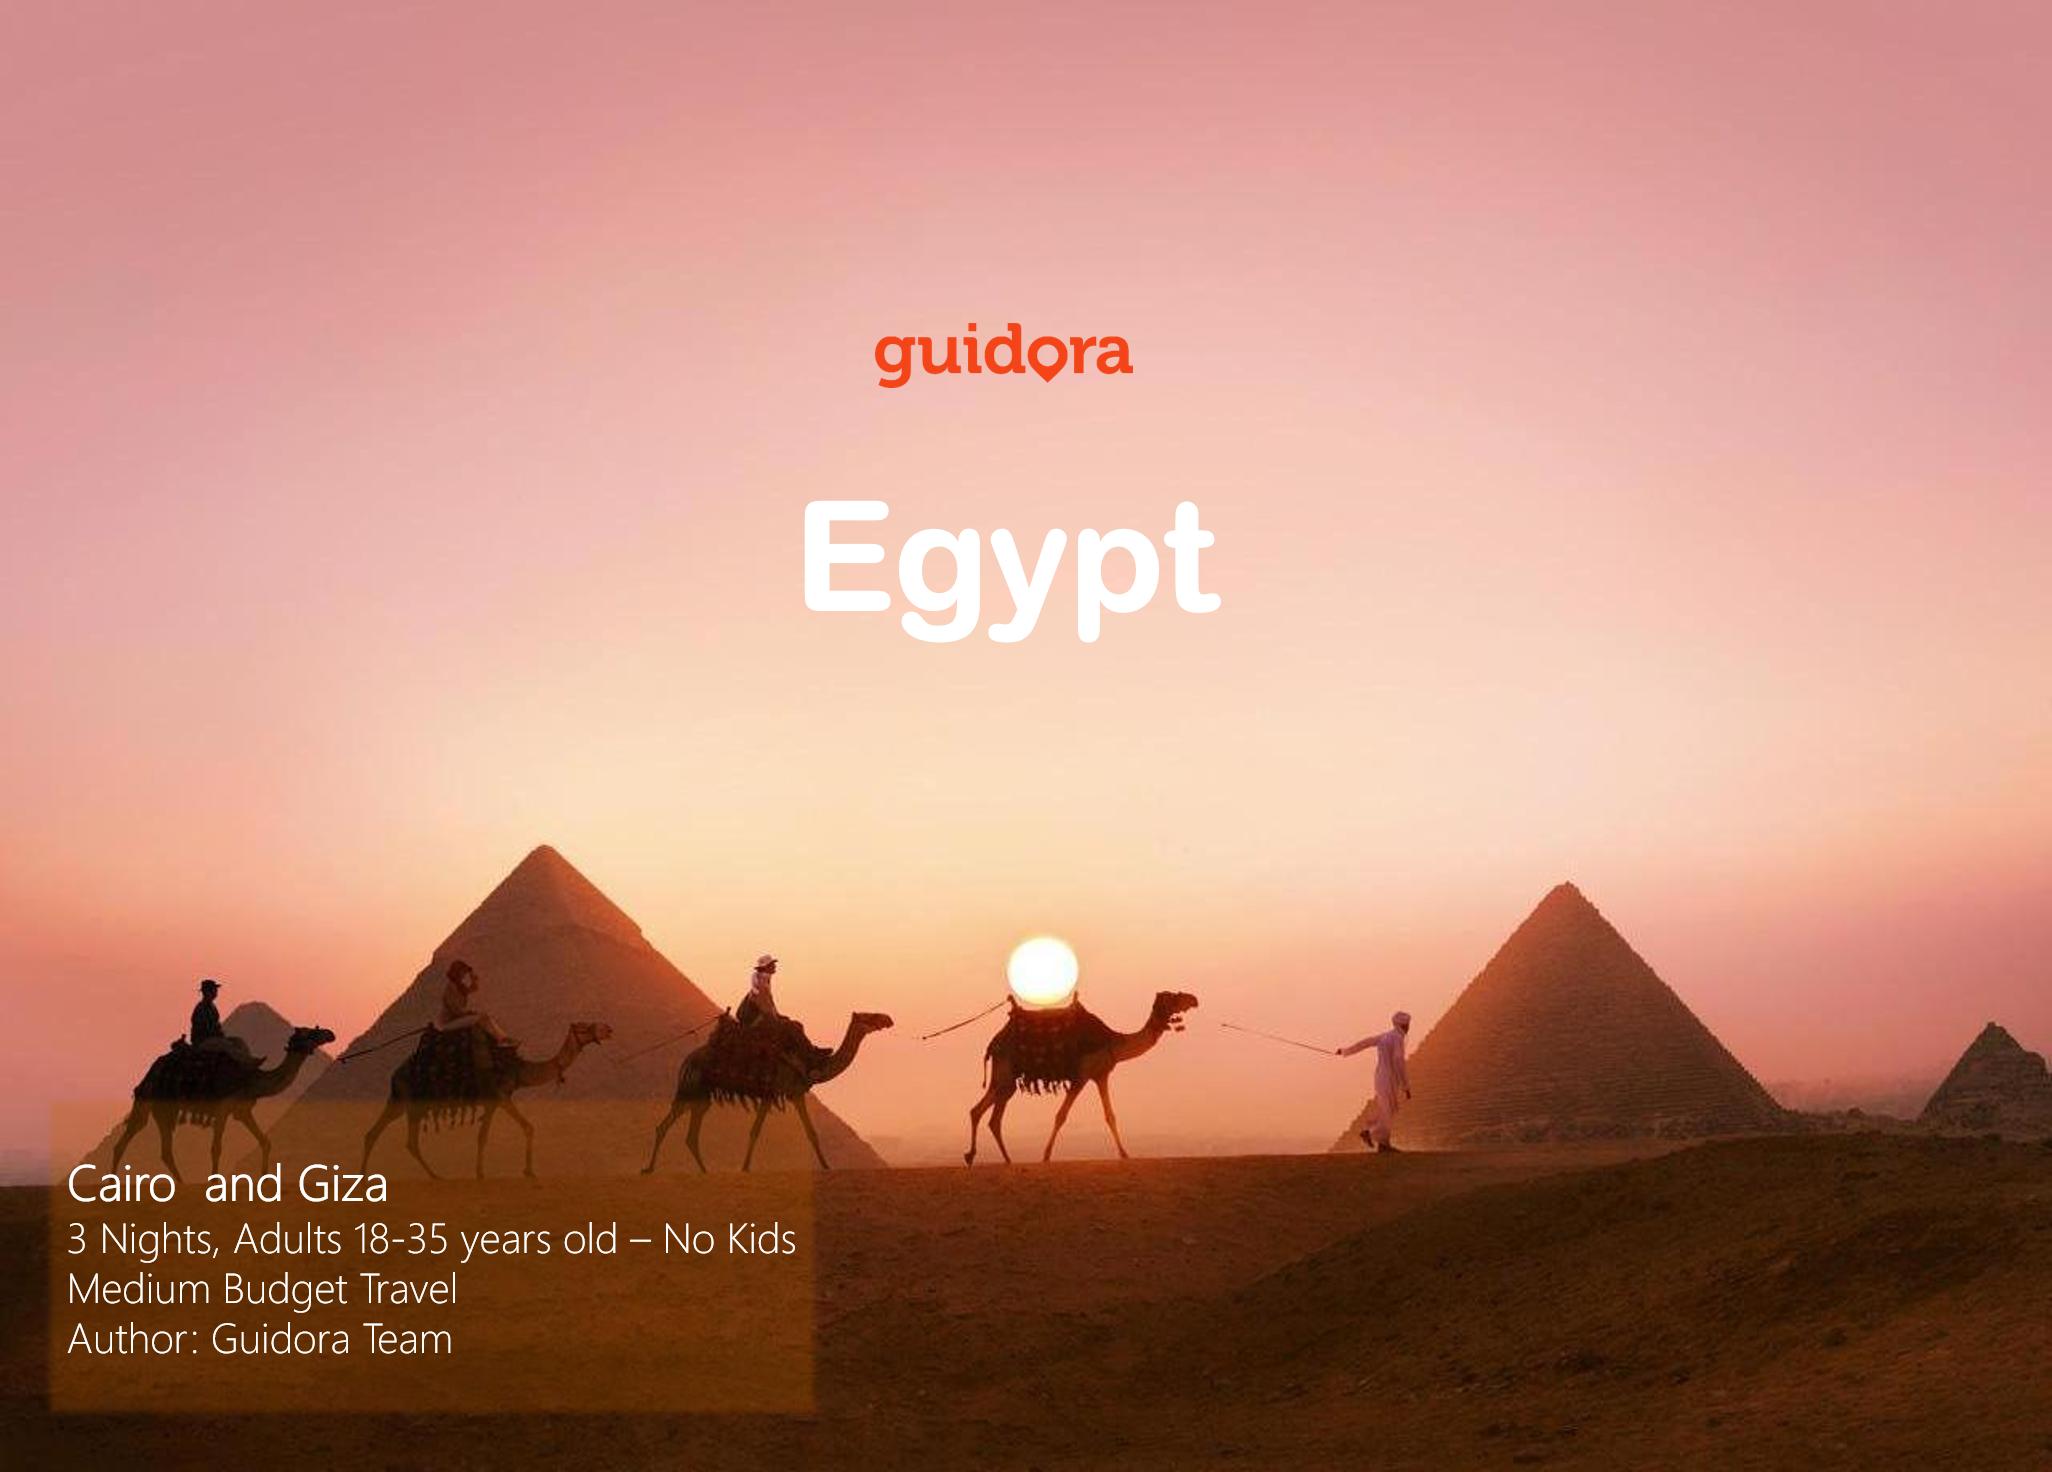 Cairo and Giza Pyramids, Egypt, 3 full days Travel Itinerary